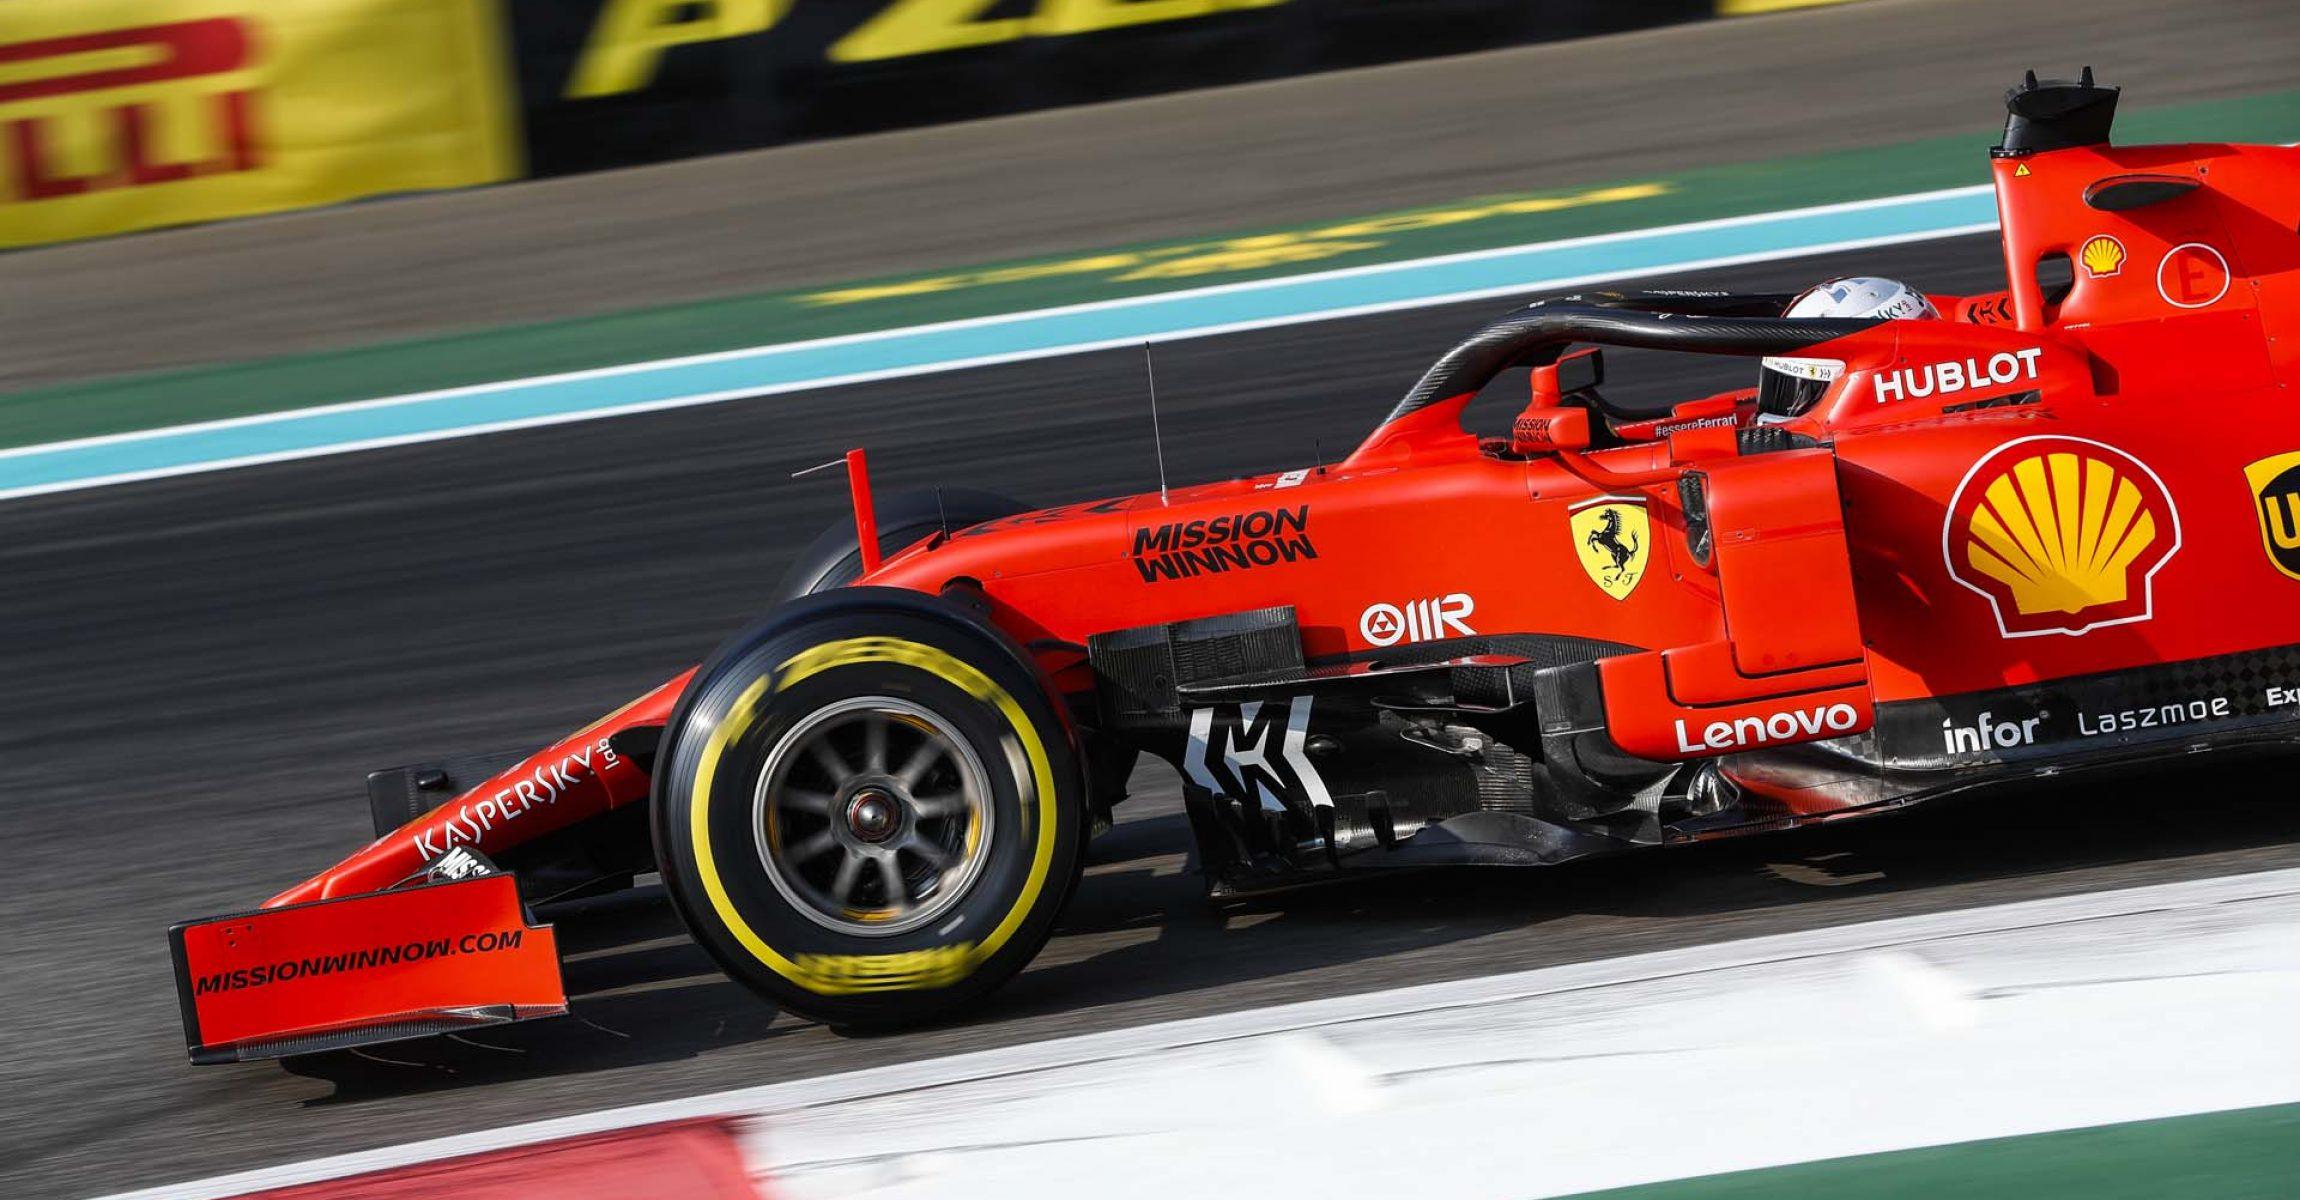 YAS MARINA CIRCUIT, UNITED ARAB EMIRATES - NOVEMBER 30: Sebastian Vettel, Ferrari SF90 during the Abu Dhabi GP at Yas Marina Circuit on November 30, 2019 in Yas Marina Circuit, United Arab Emirates. (Photo by Zak Mauger / LAT Images)